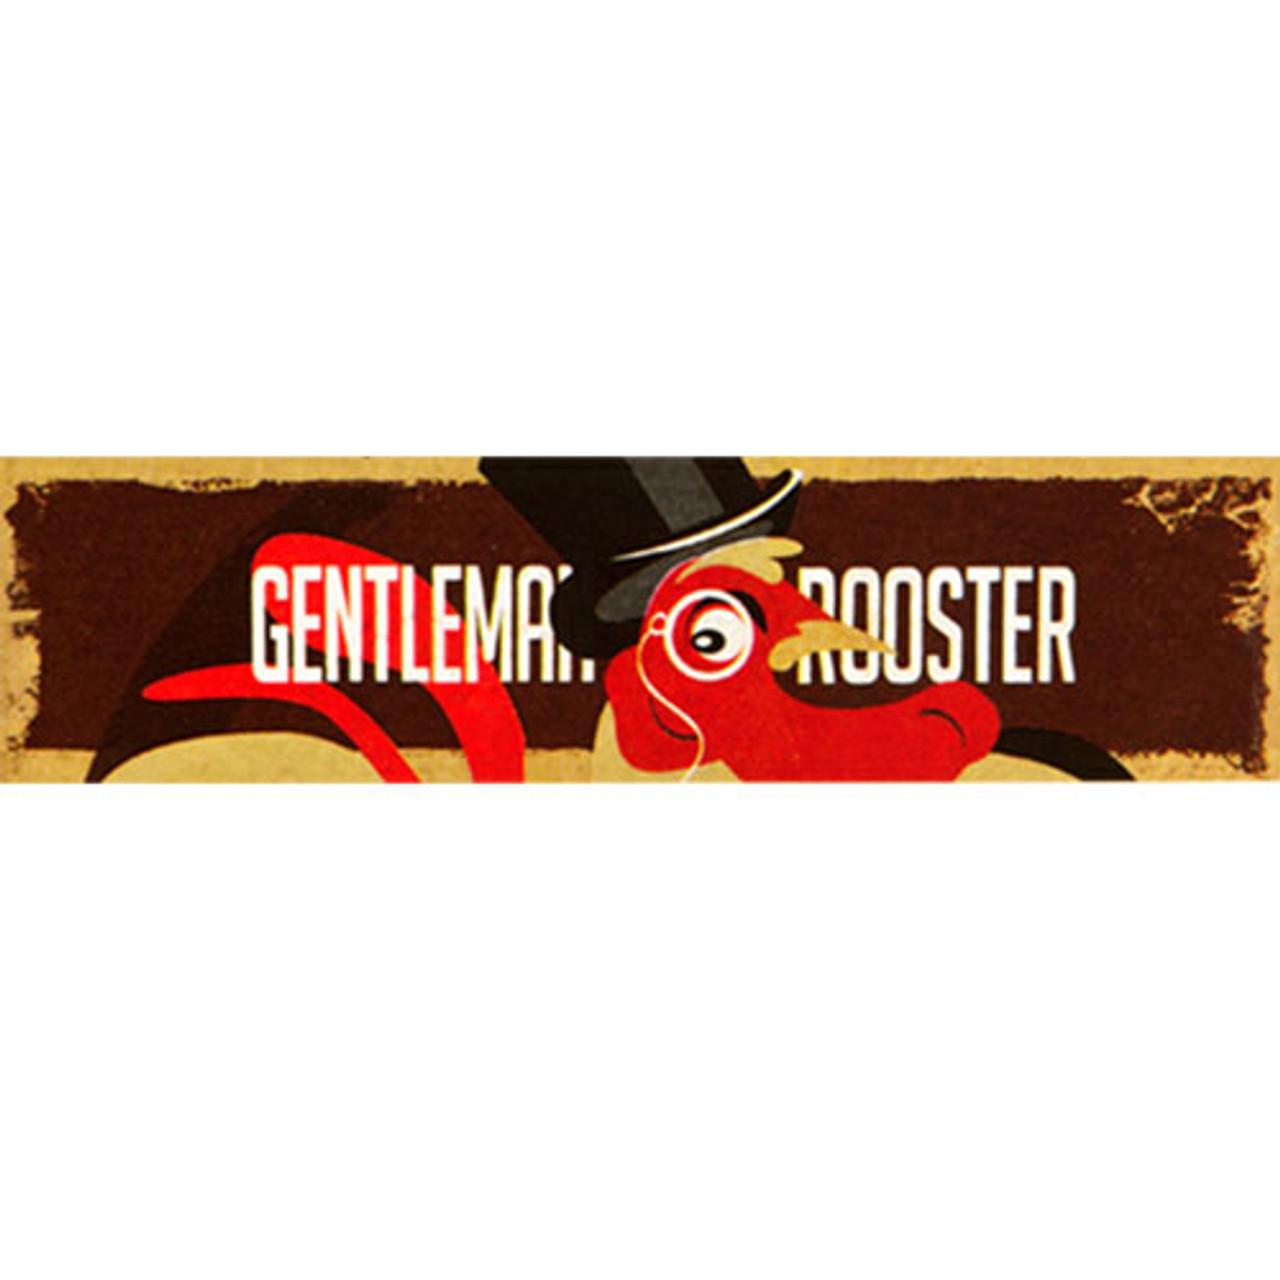 Gentleman Rooster Gigante Cigars - 6 x 60 (Bundle of 20)